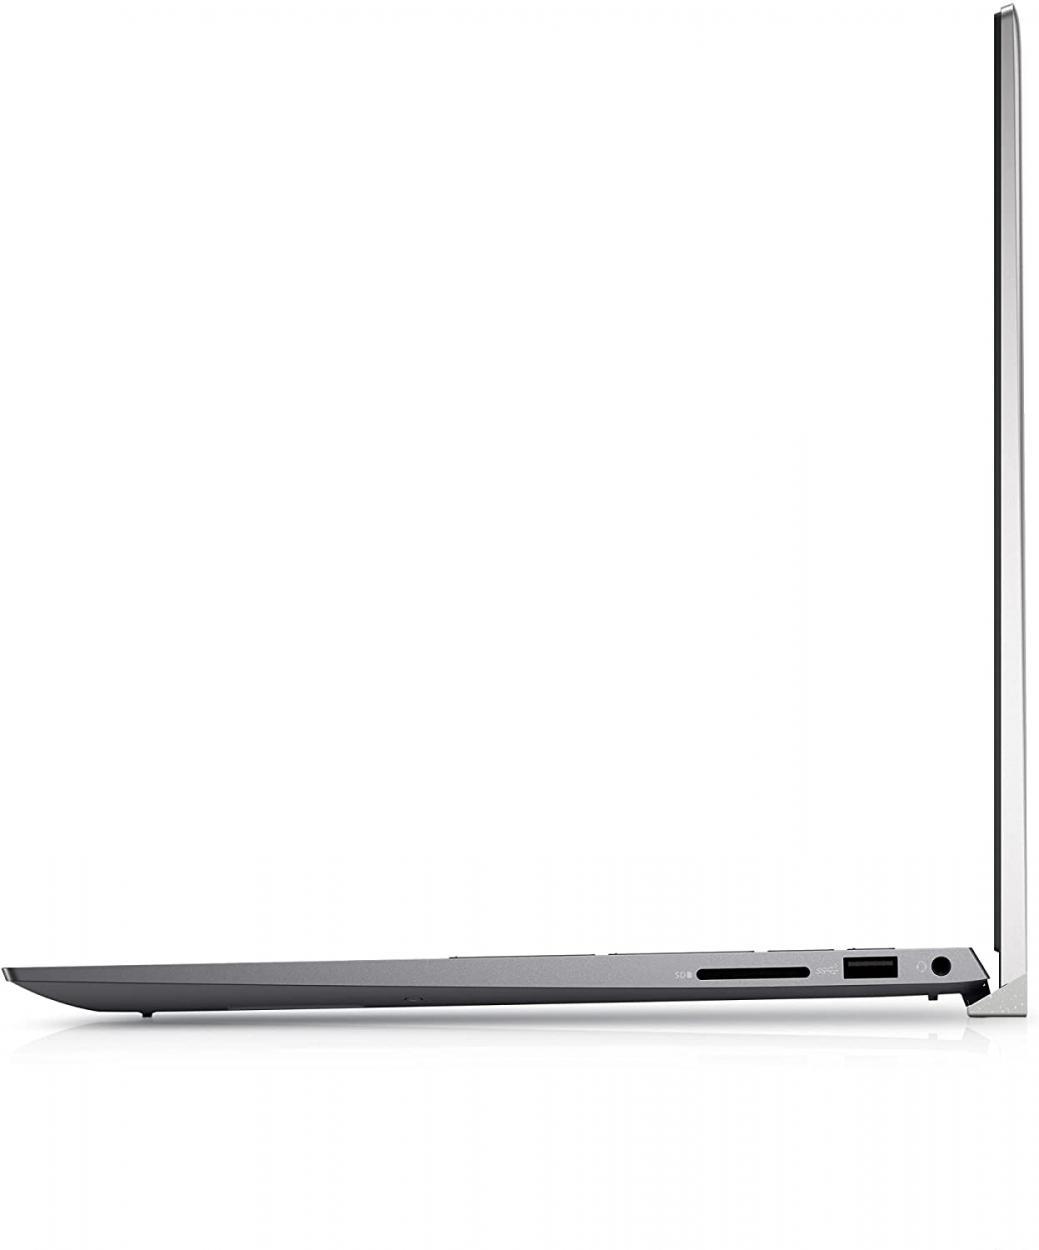 Ordinateur portable Dell Inspiron 15 5518 Argent - Core i7-H, MX450, SSD 512 Go - photo 5